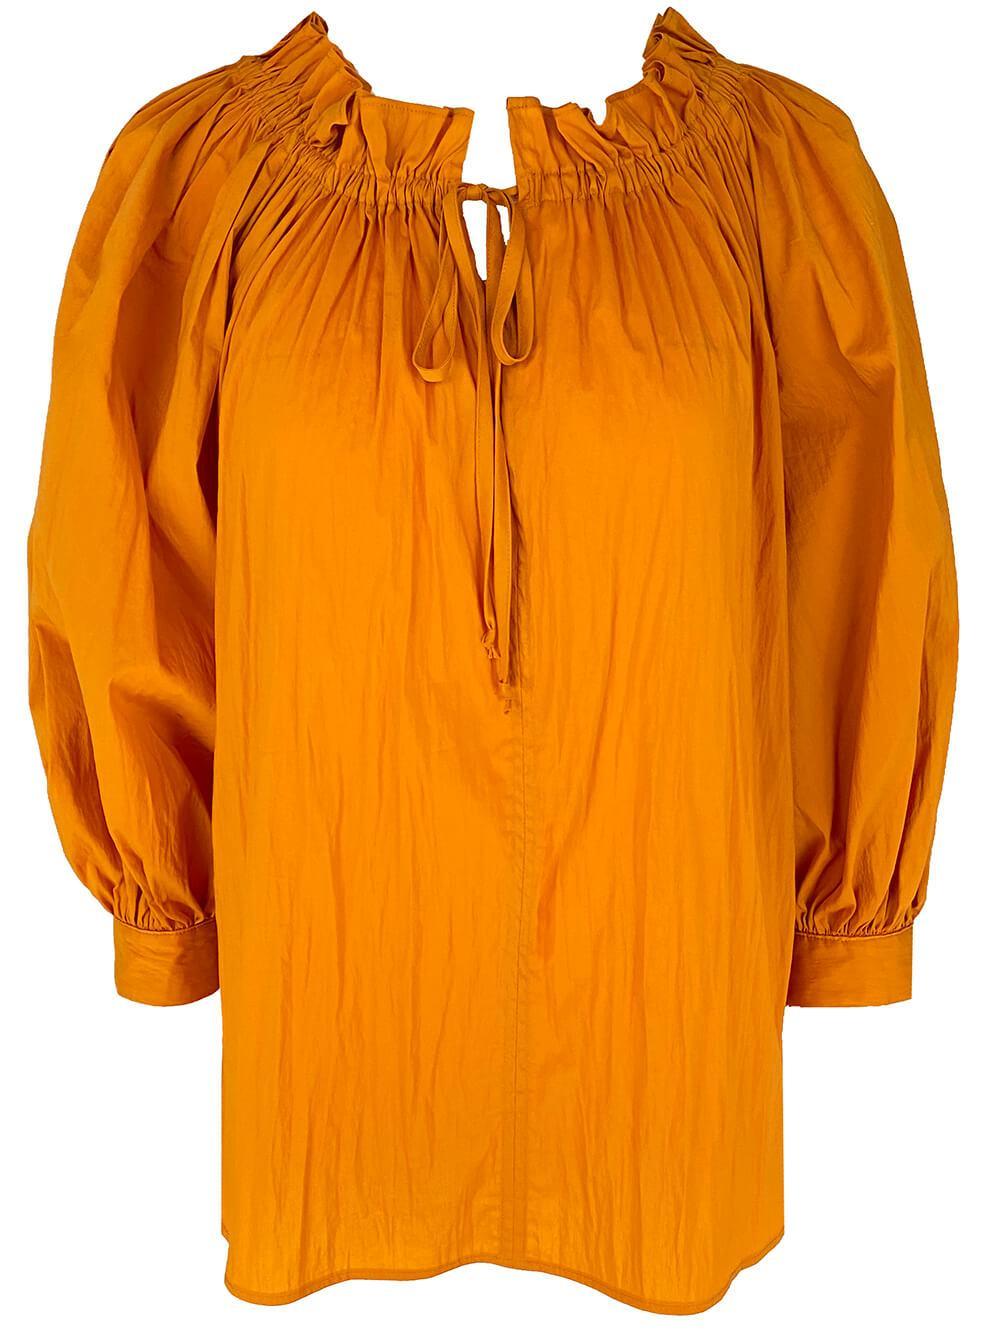 Raven Tie Neck Poplin Shirt Item # 1413-S21